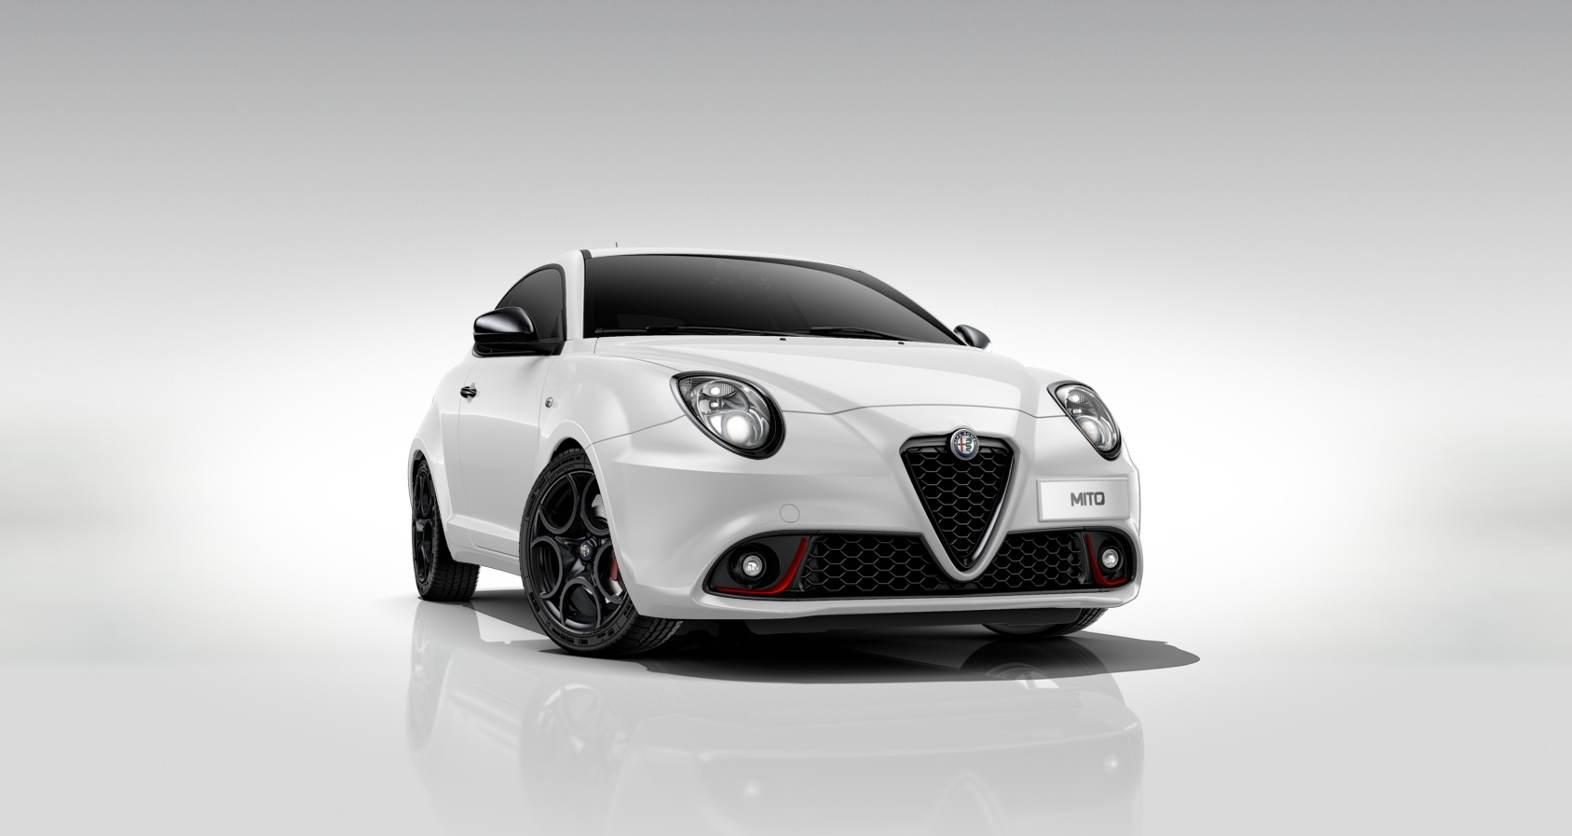 foto Alfa Romeo Mito - 1.6 JTDm 120cv - Distinctive - Nero Etna - 2010 (RC) - 6